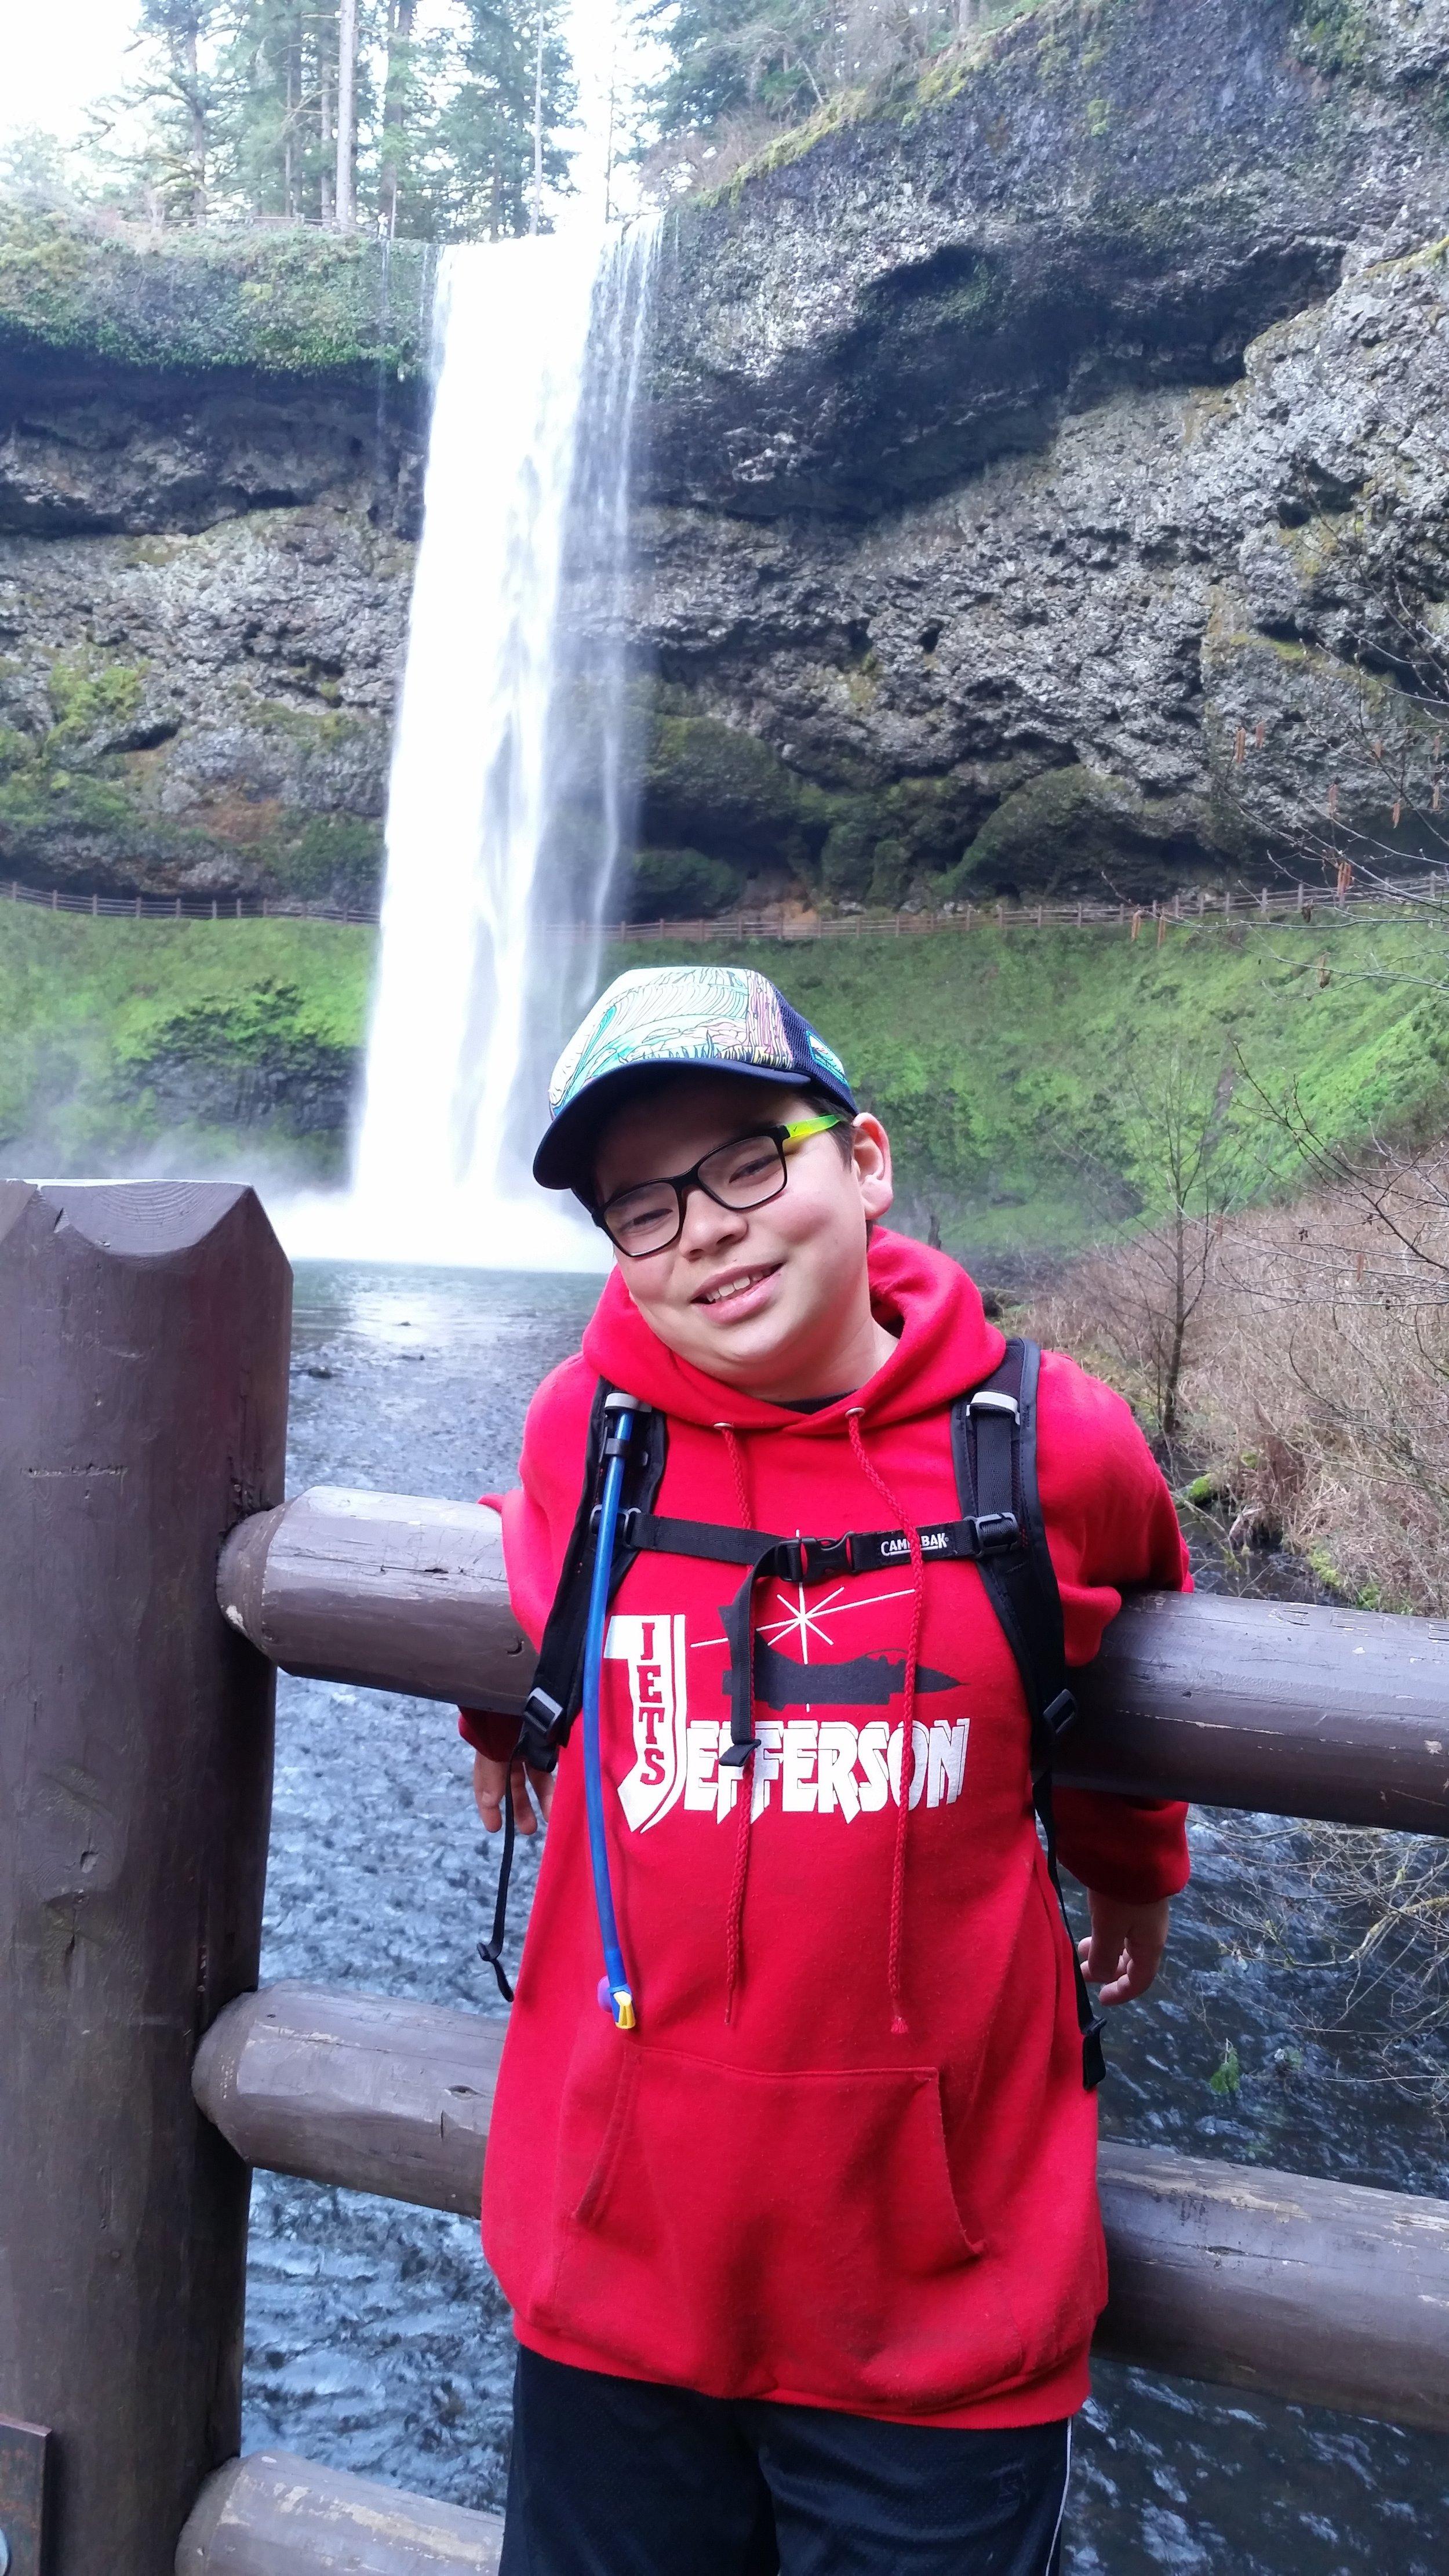 SILVER FALLS STATE PARK - South Falls - Oregon